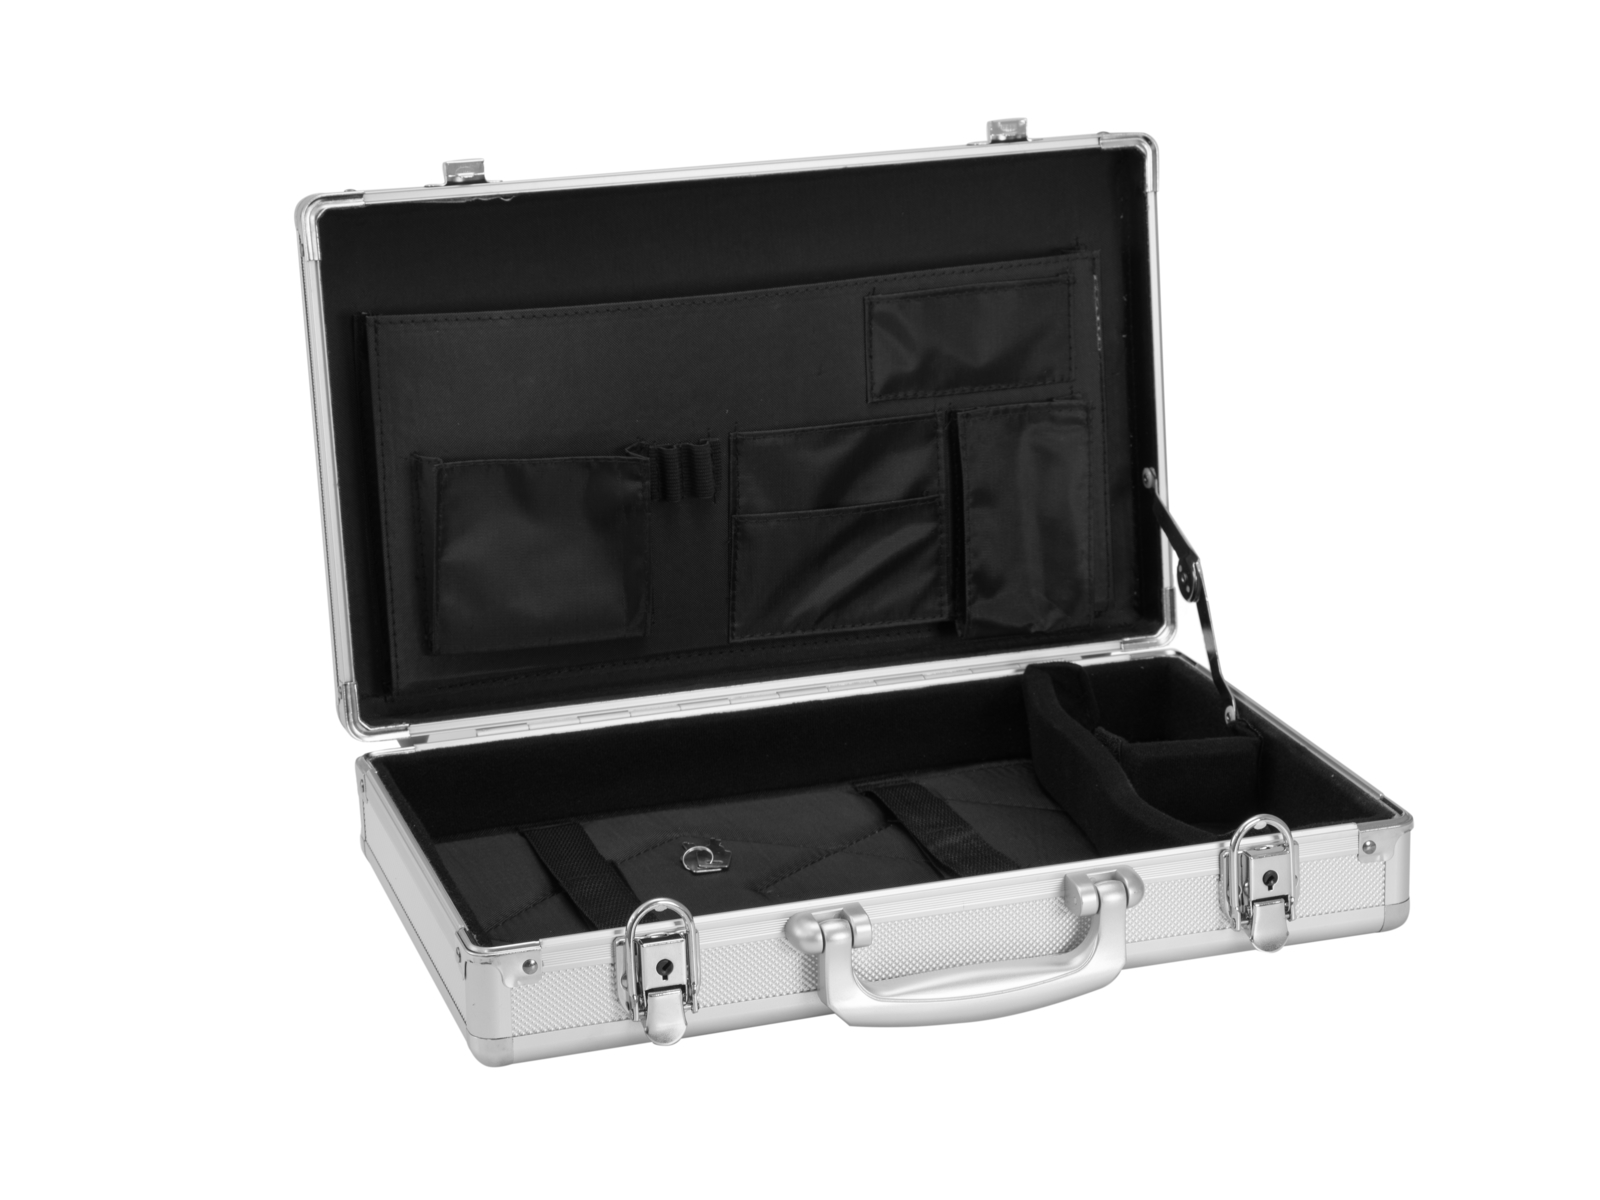 ROADINGER Laptop-Case MB-13